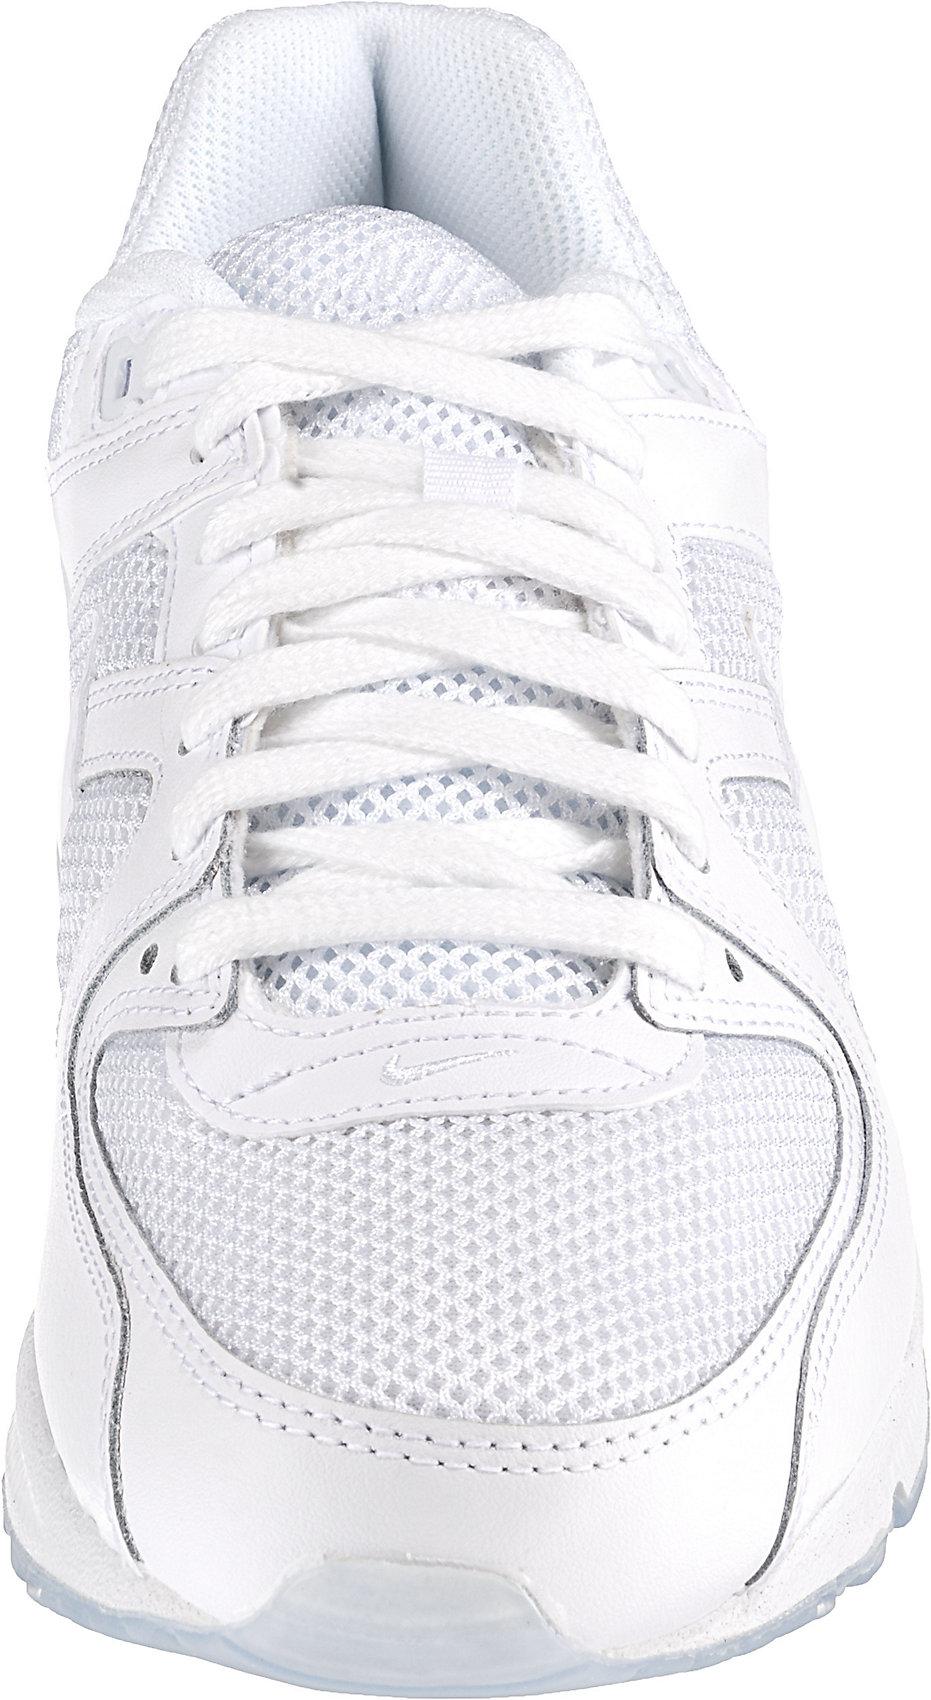 Nike Sportswear, Air Max Command Sneakers Low, weiß